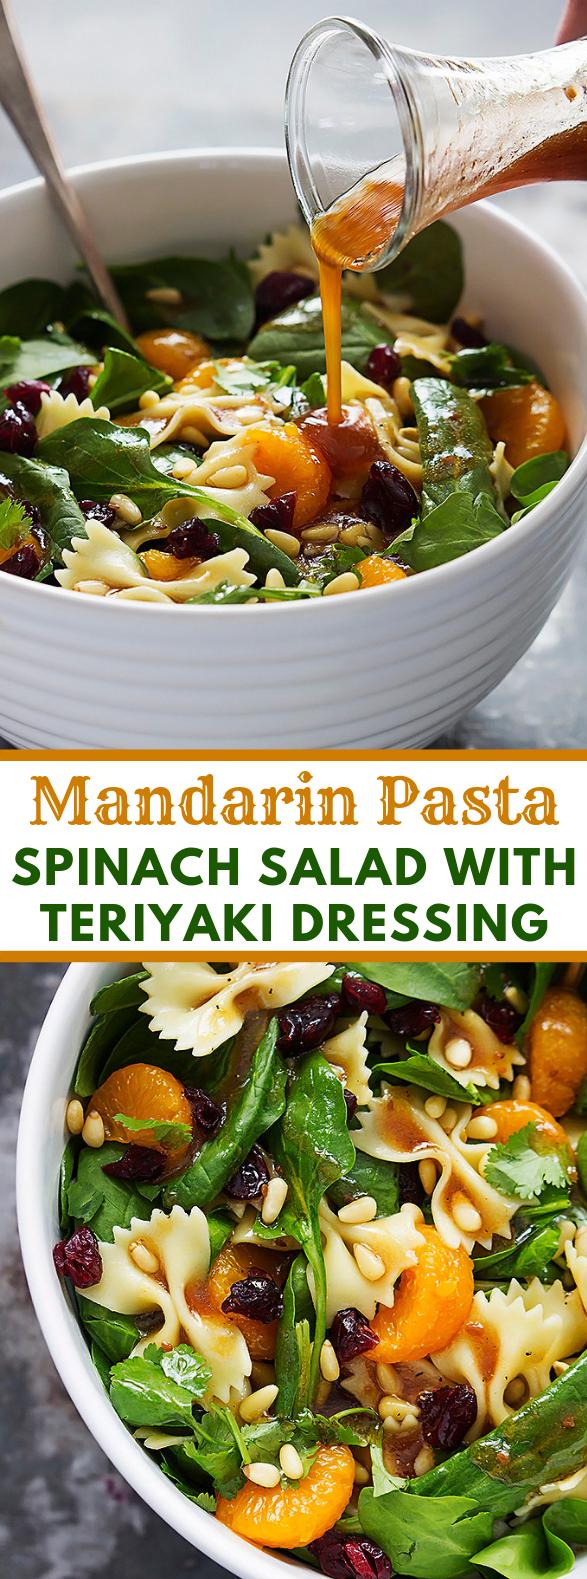 MANDARIN PASTA SPINACH SALAD WITH TERIYAKI DRESSING #vegetarian #healthy